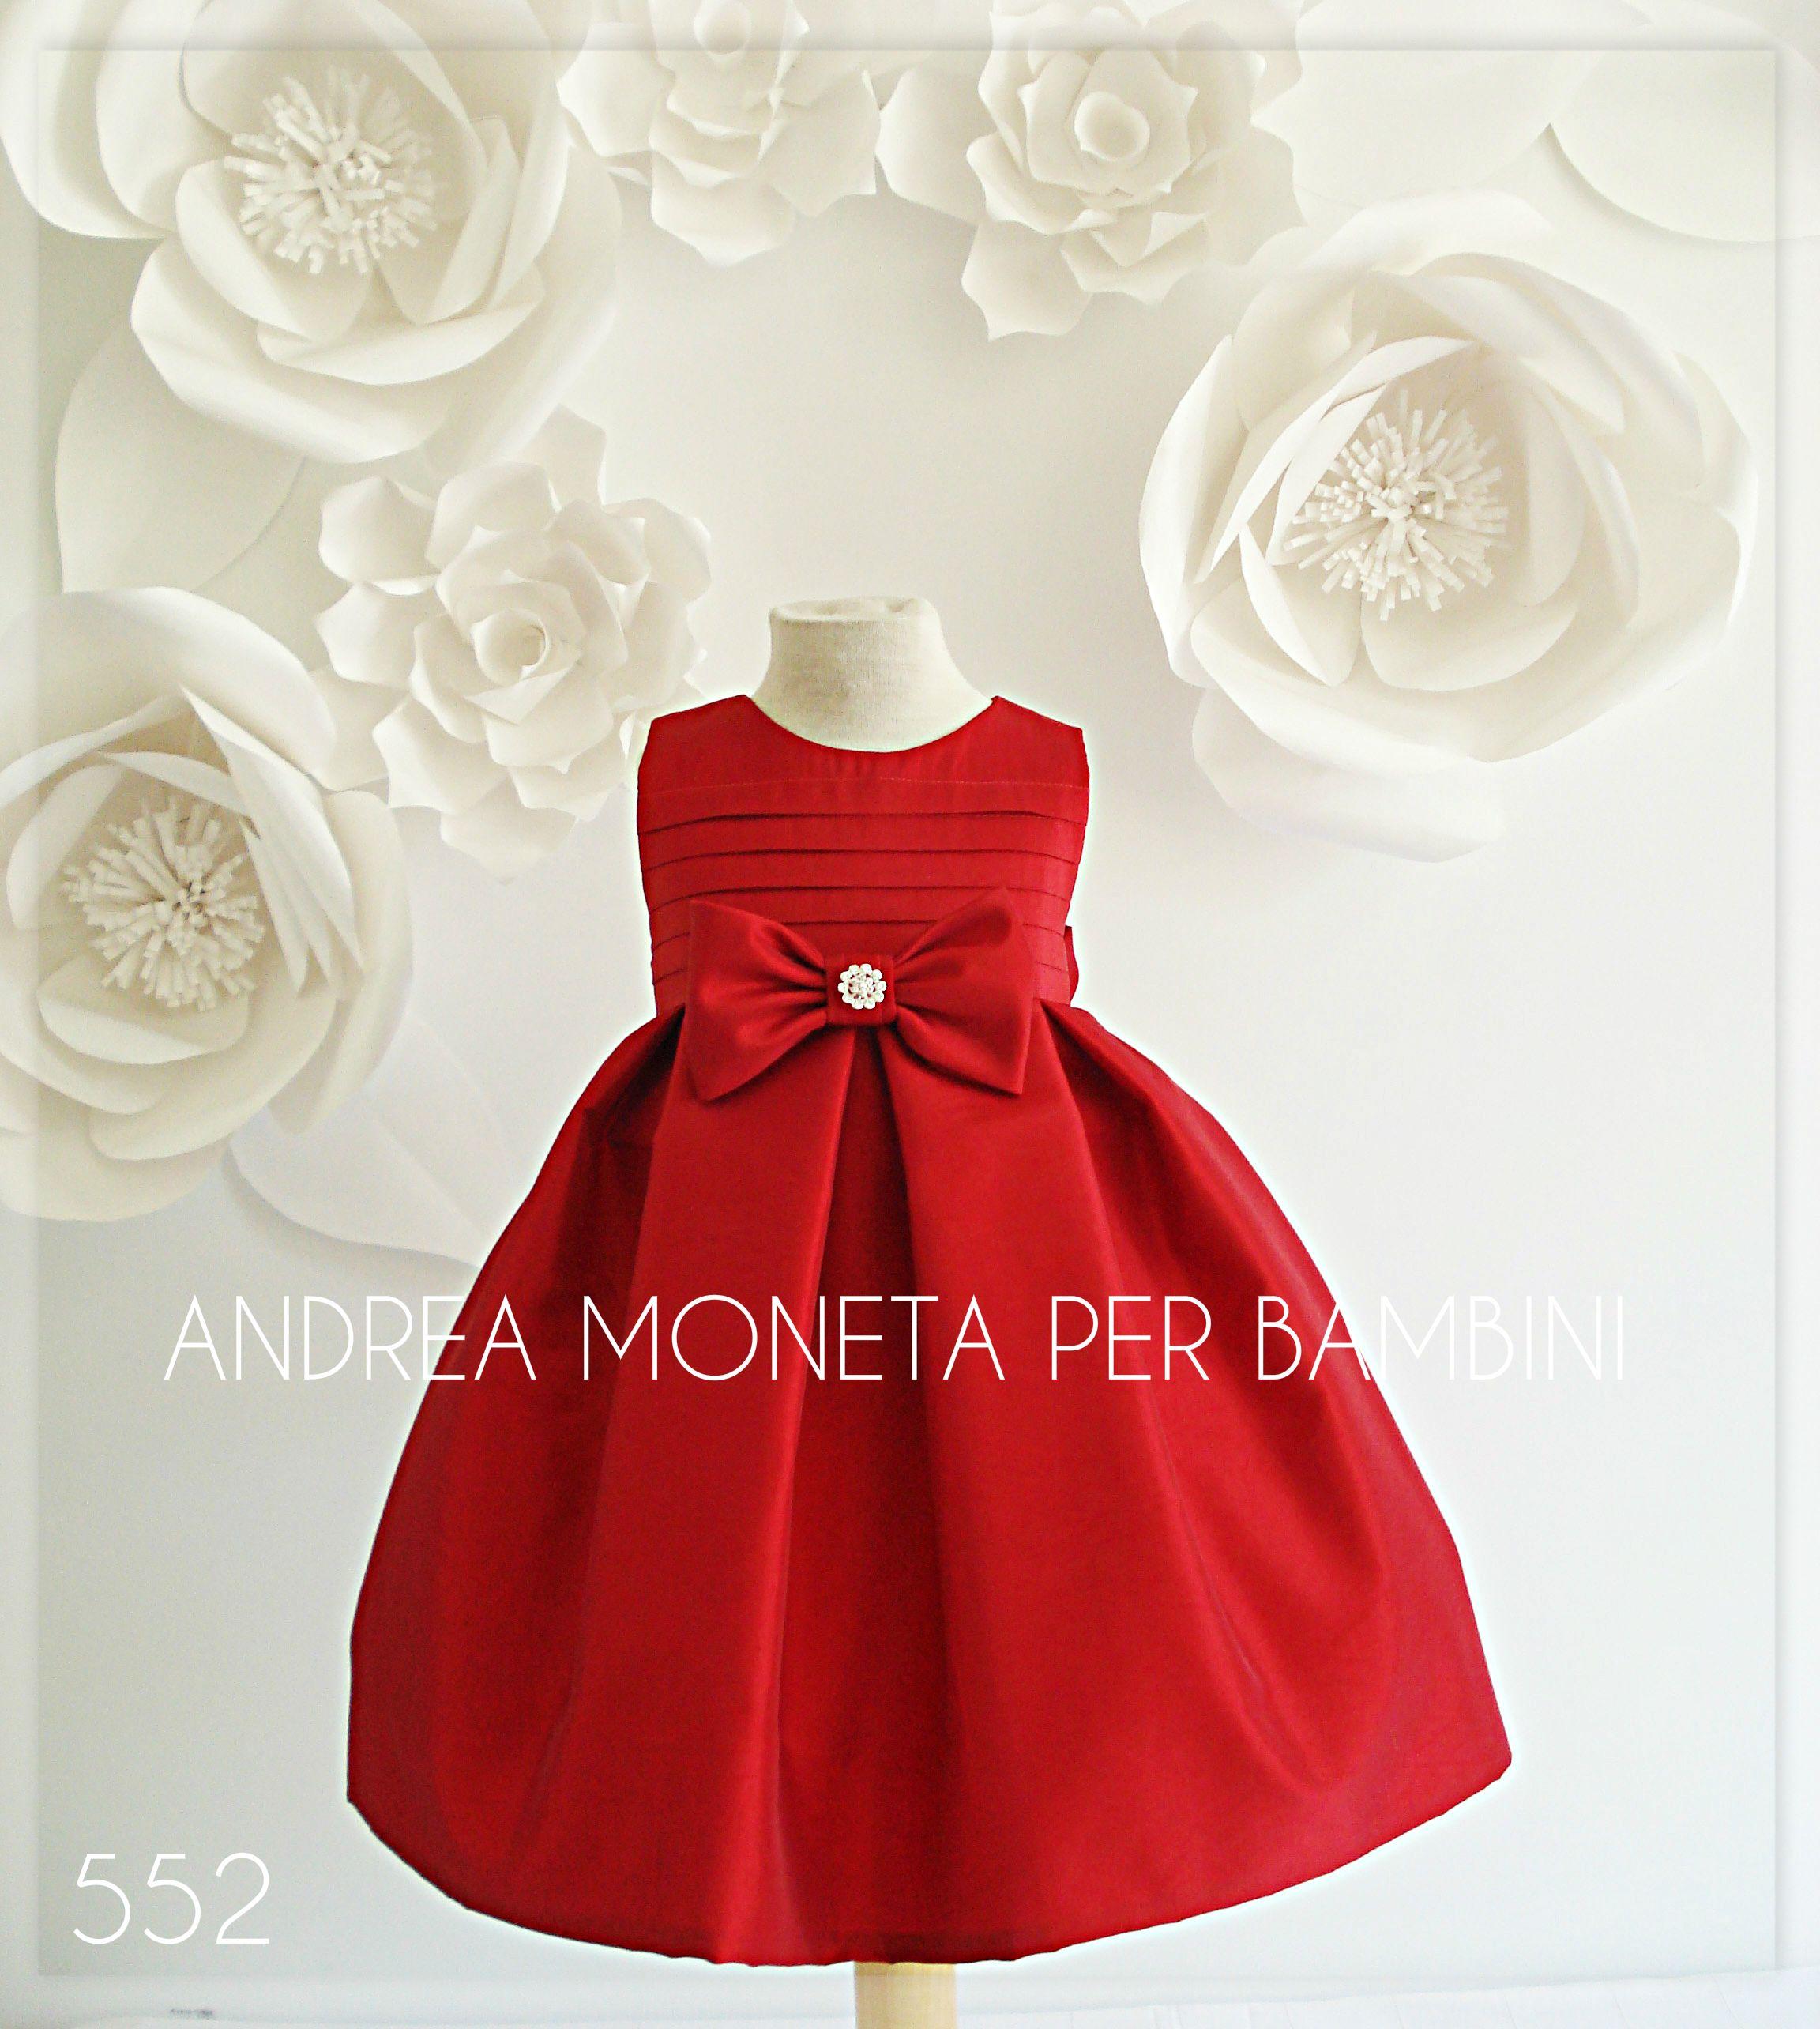 Hermoso vestido rojo fiesta bautizo boda bebe niña bautismo andrea ...